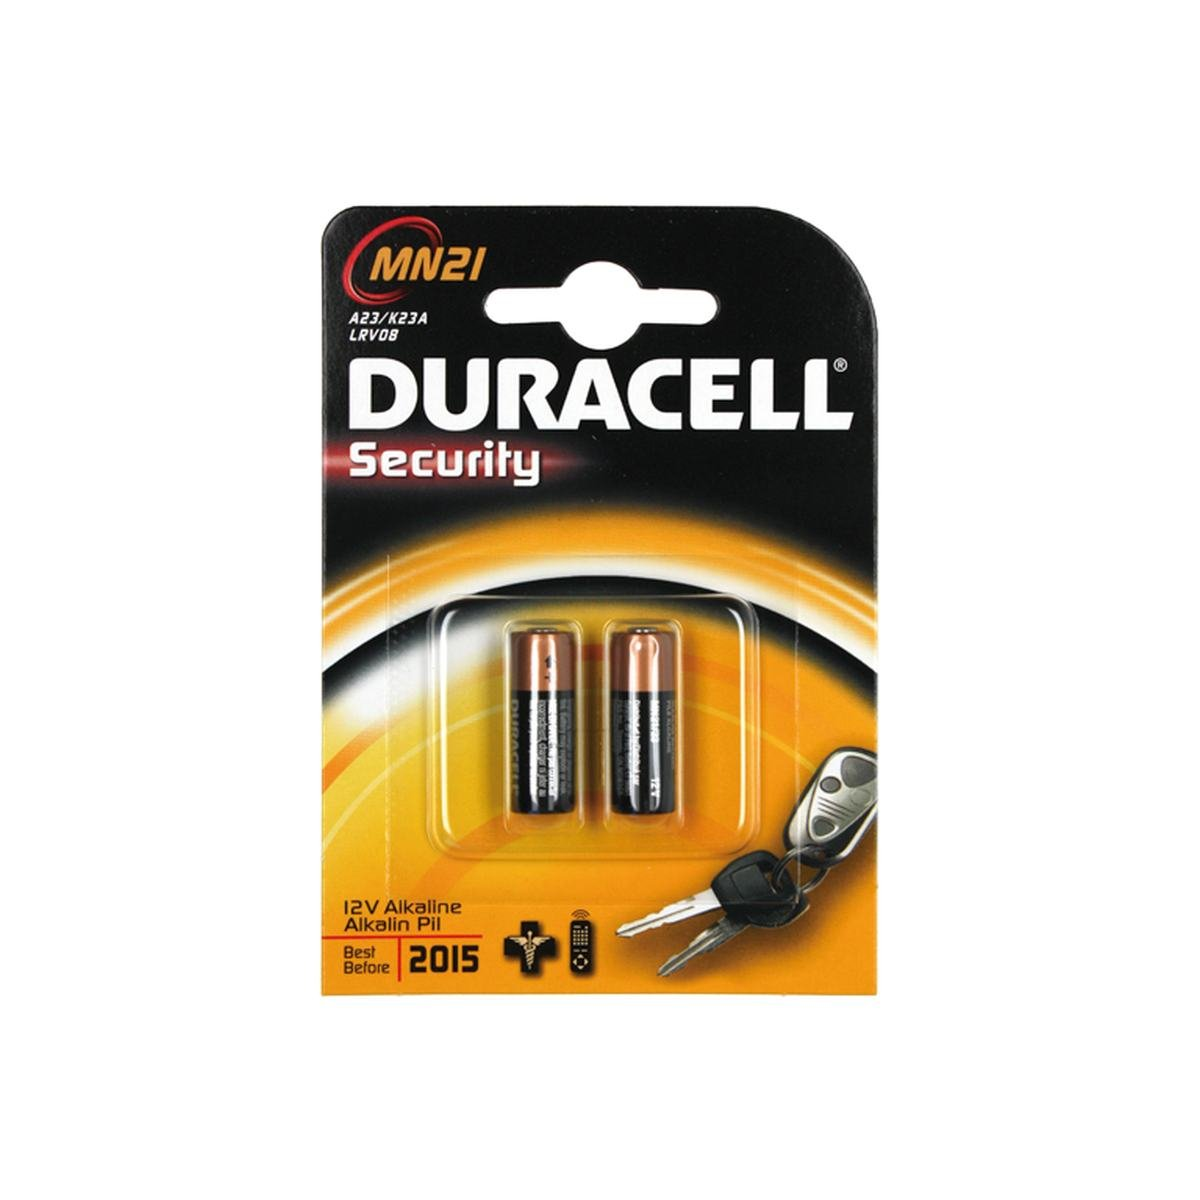 Batteri MN21 / 23AE 12V Alkaline 2 stk. pakke